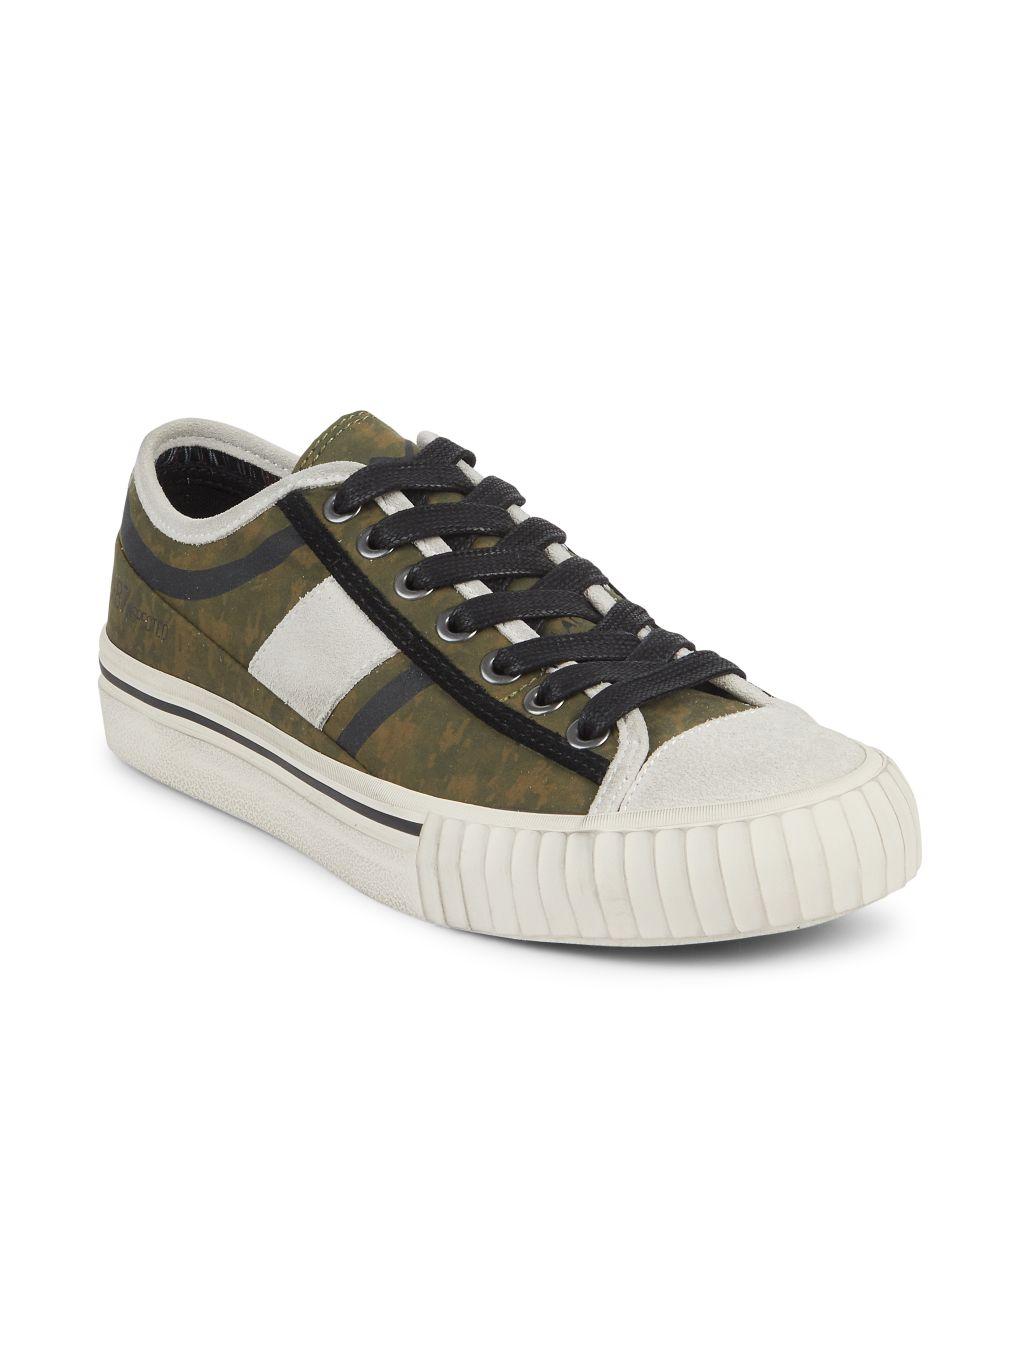 John Varvatos Vulcanized Surplus Suede-Trim Low Top Sneakers